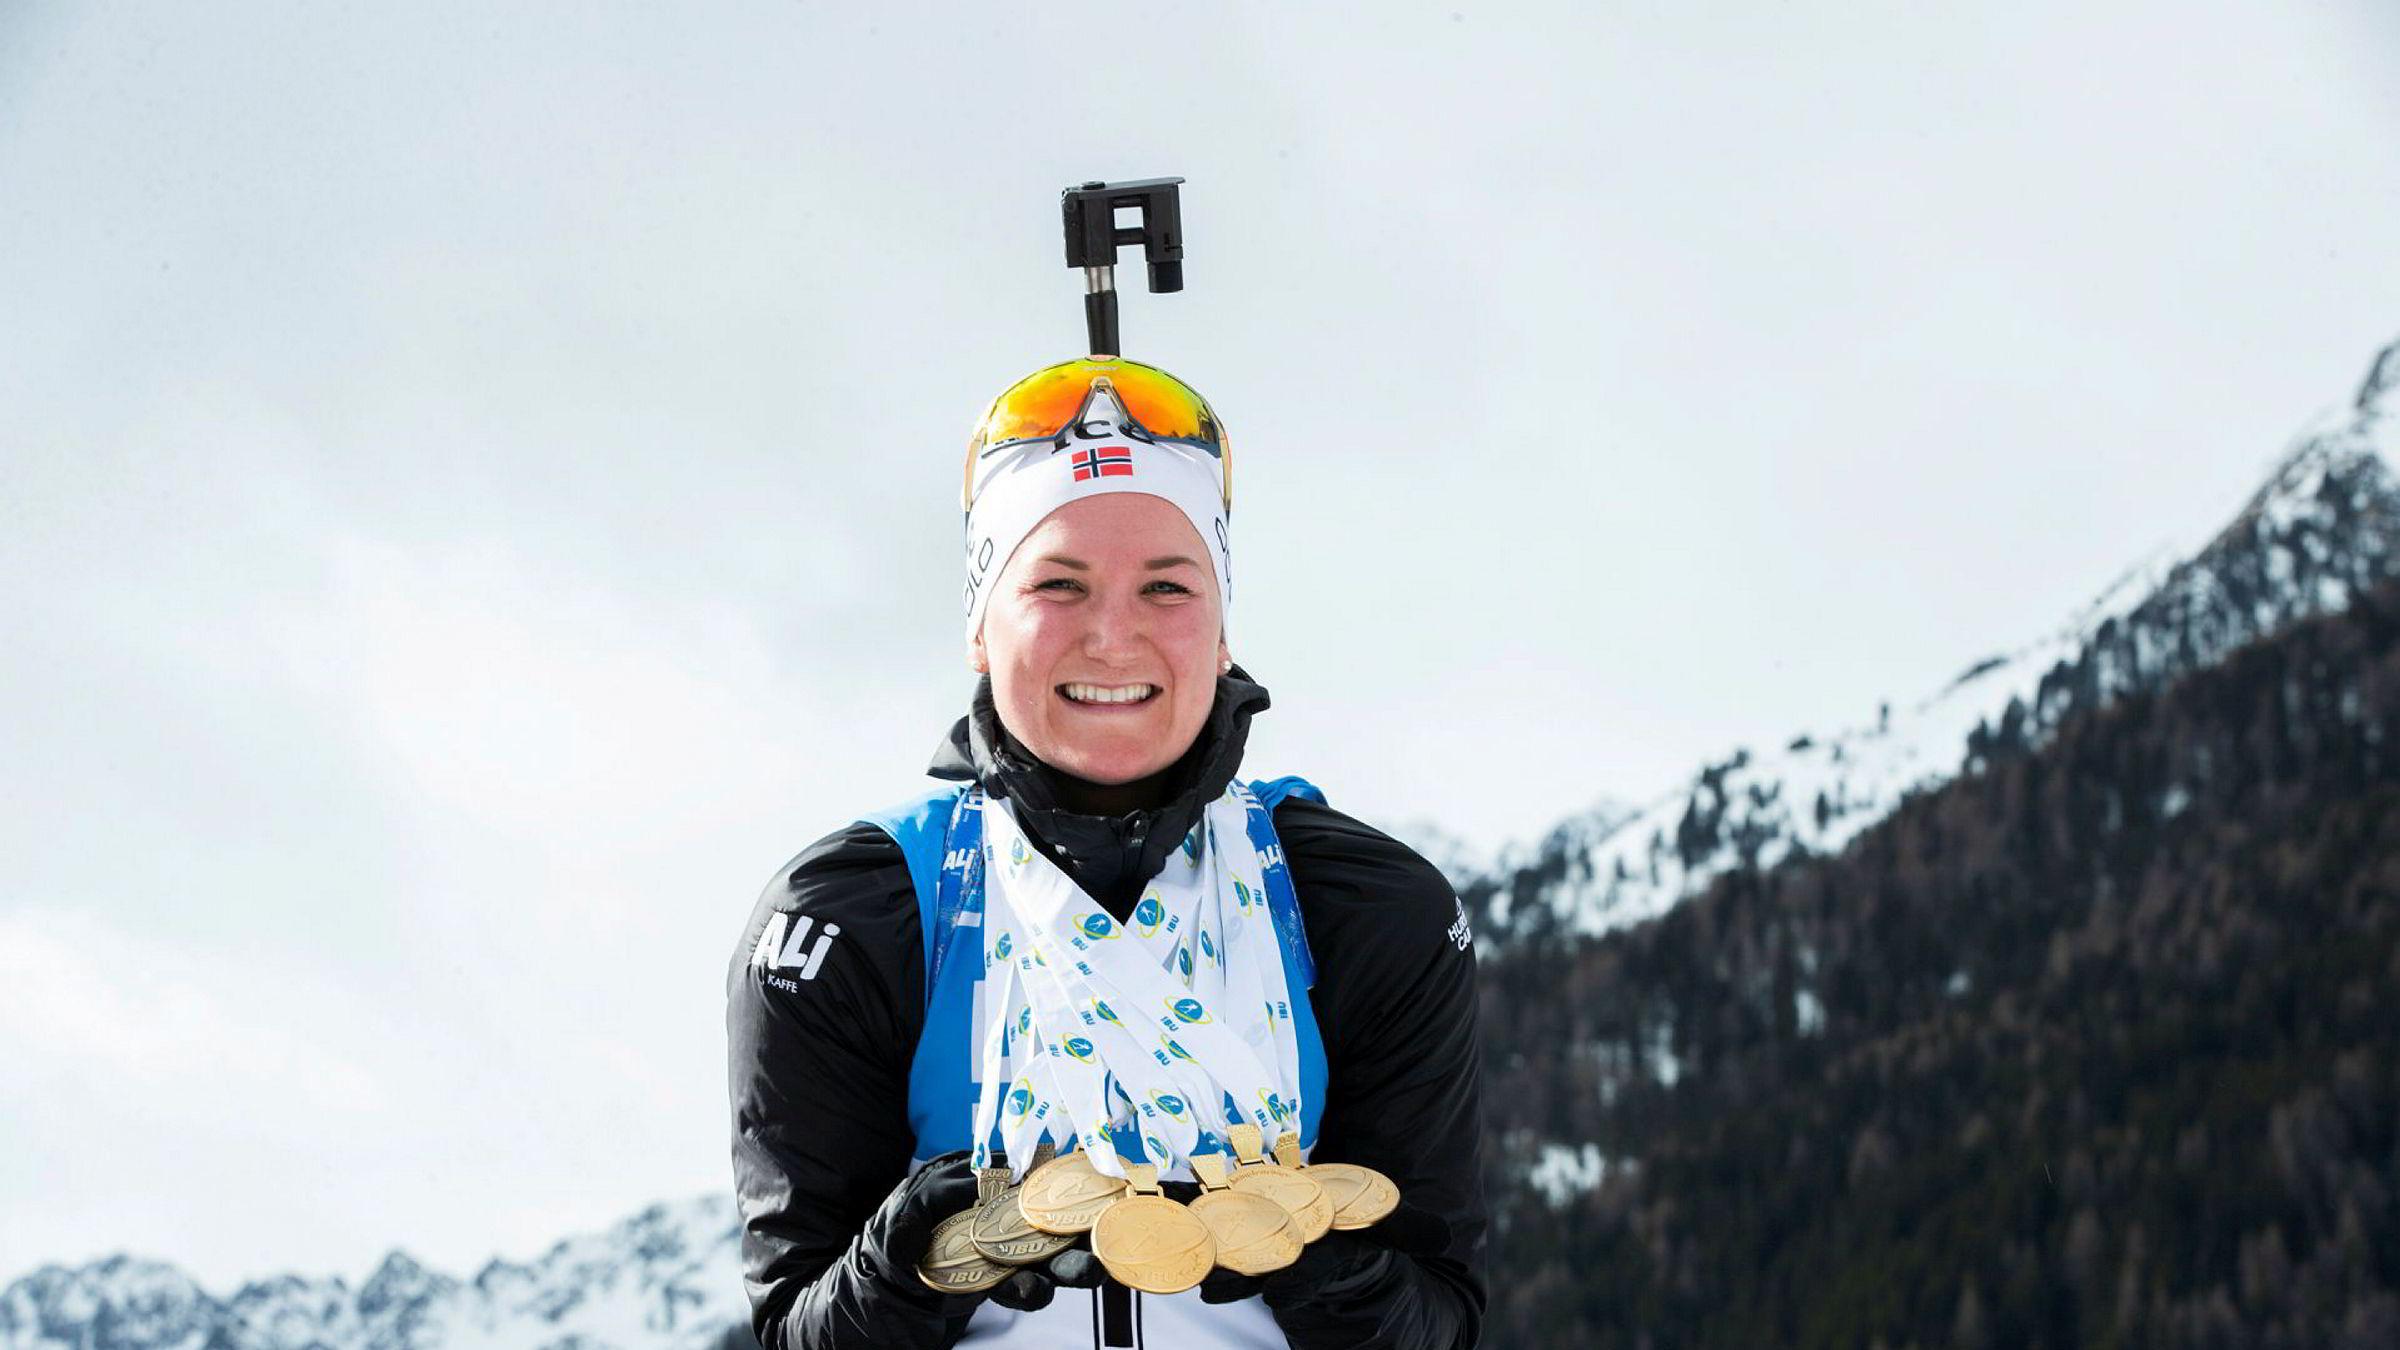 Marte Olsbu Røiseland tok 7 medaljer under VM i skiskyting 2020 i Anterselva.Foto: Berit Roald / NTB scanpix